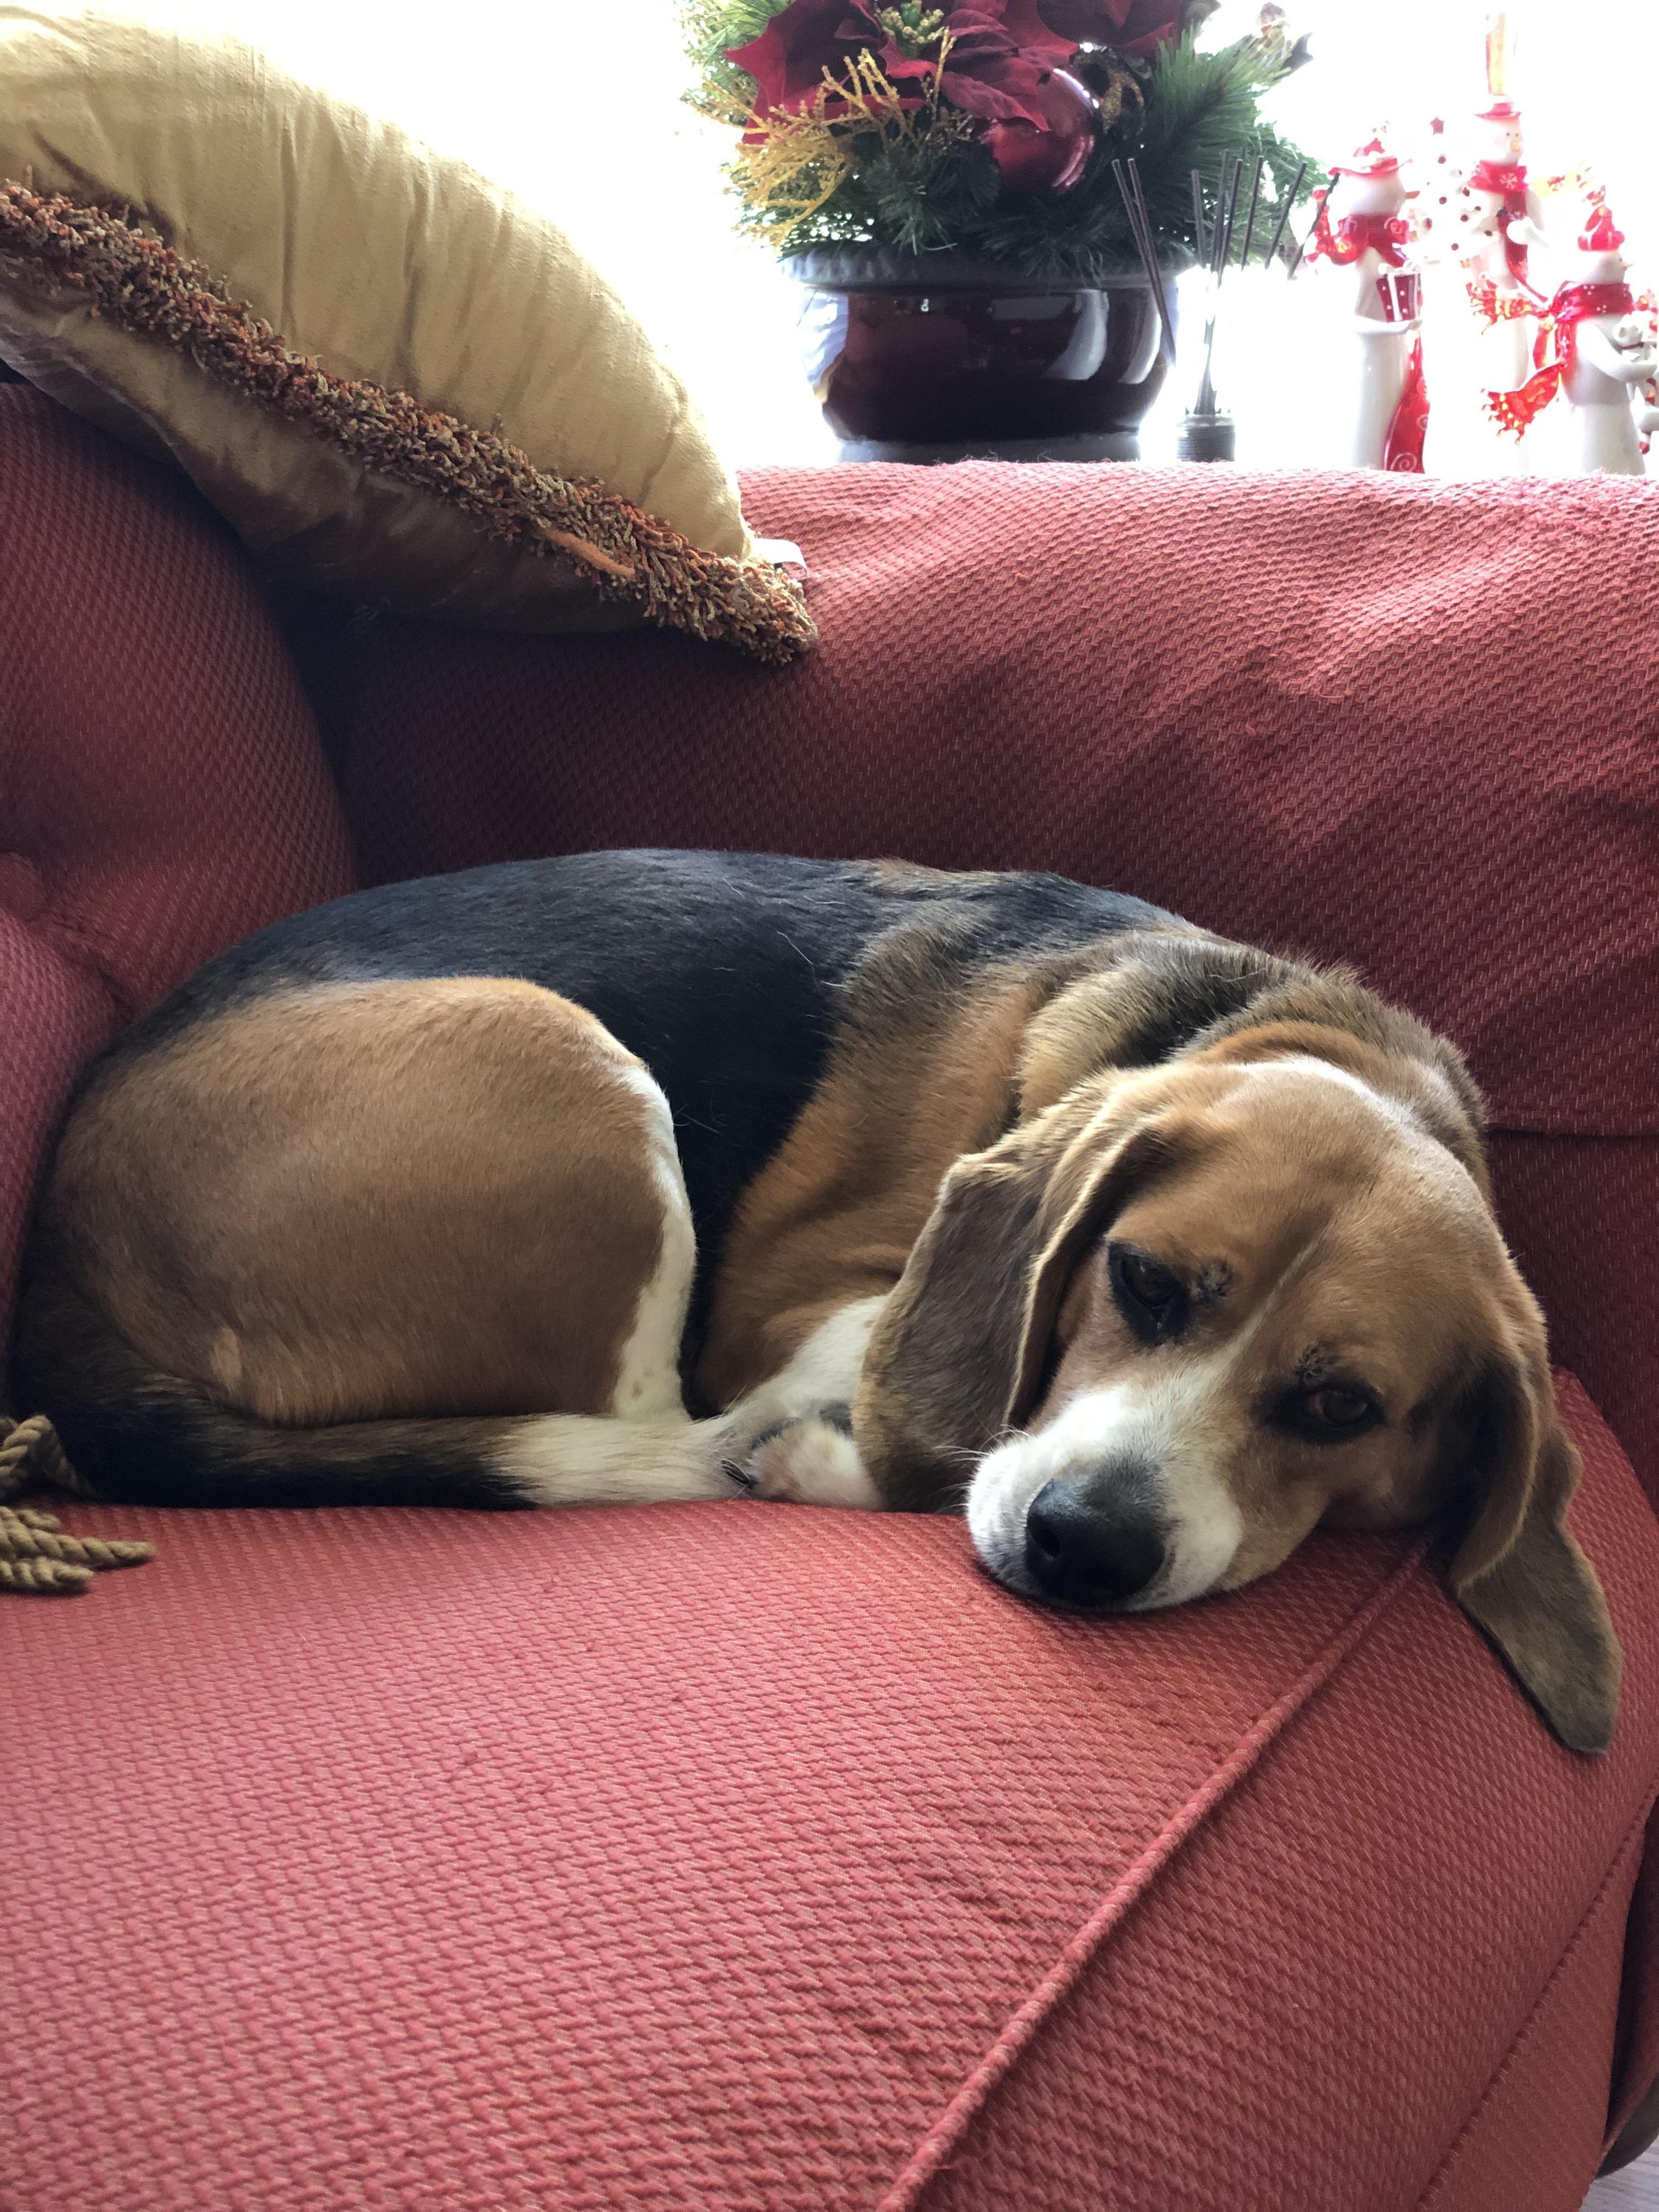 Waiting For Christmas Presents Http Bit Ly 2lxga7i Beagle